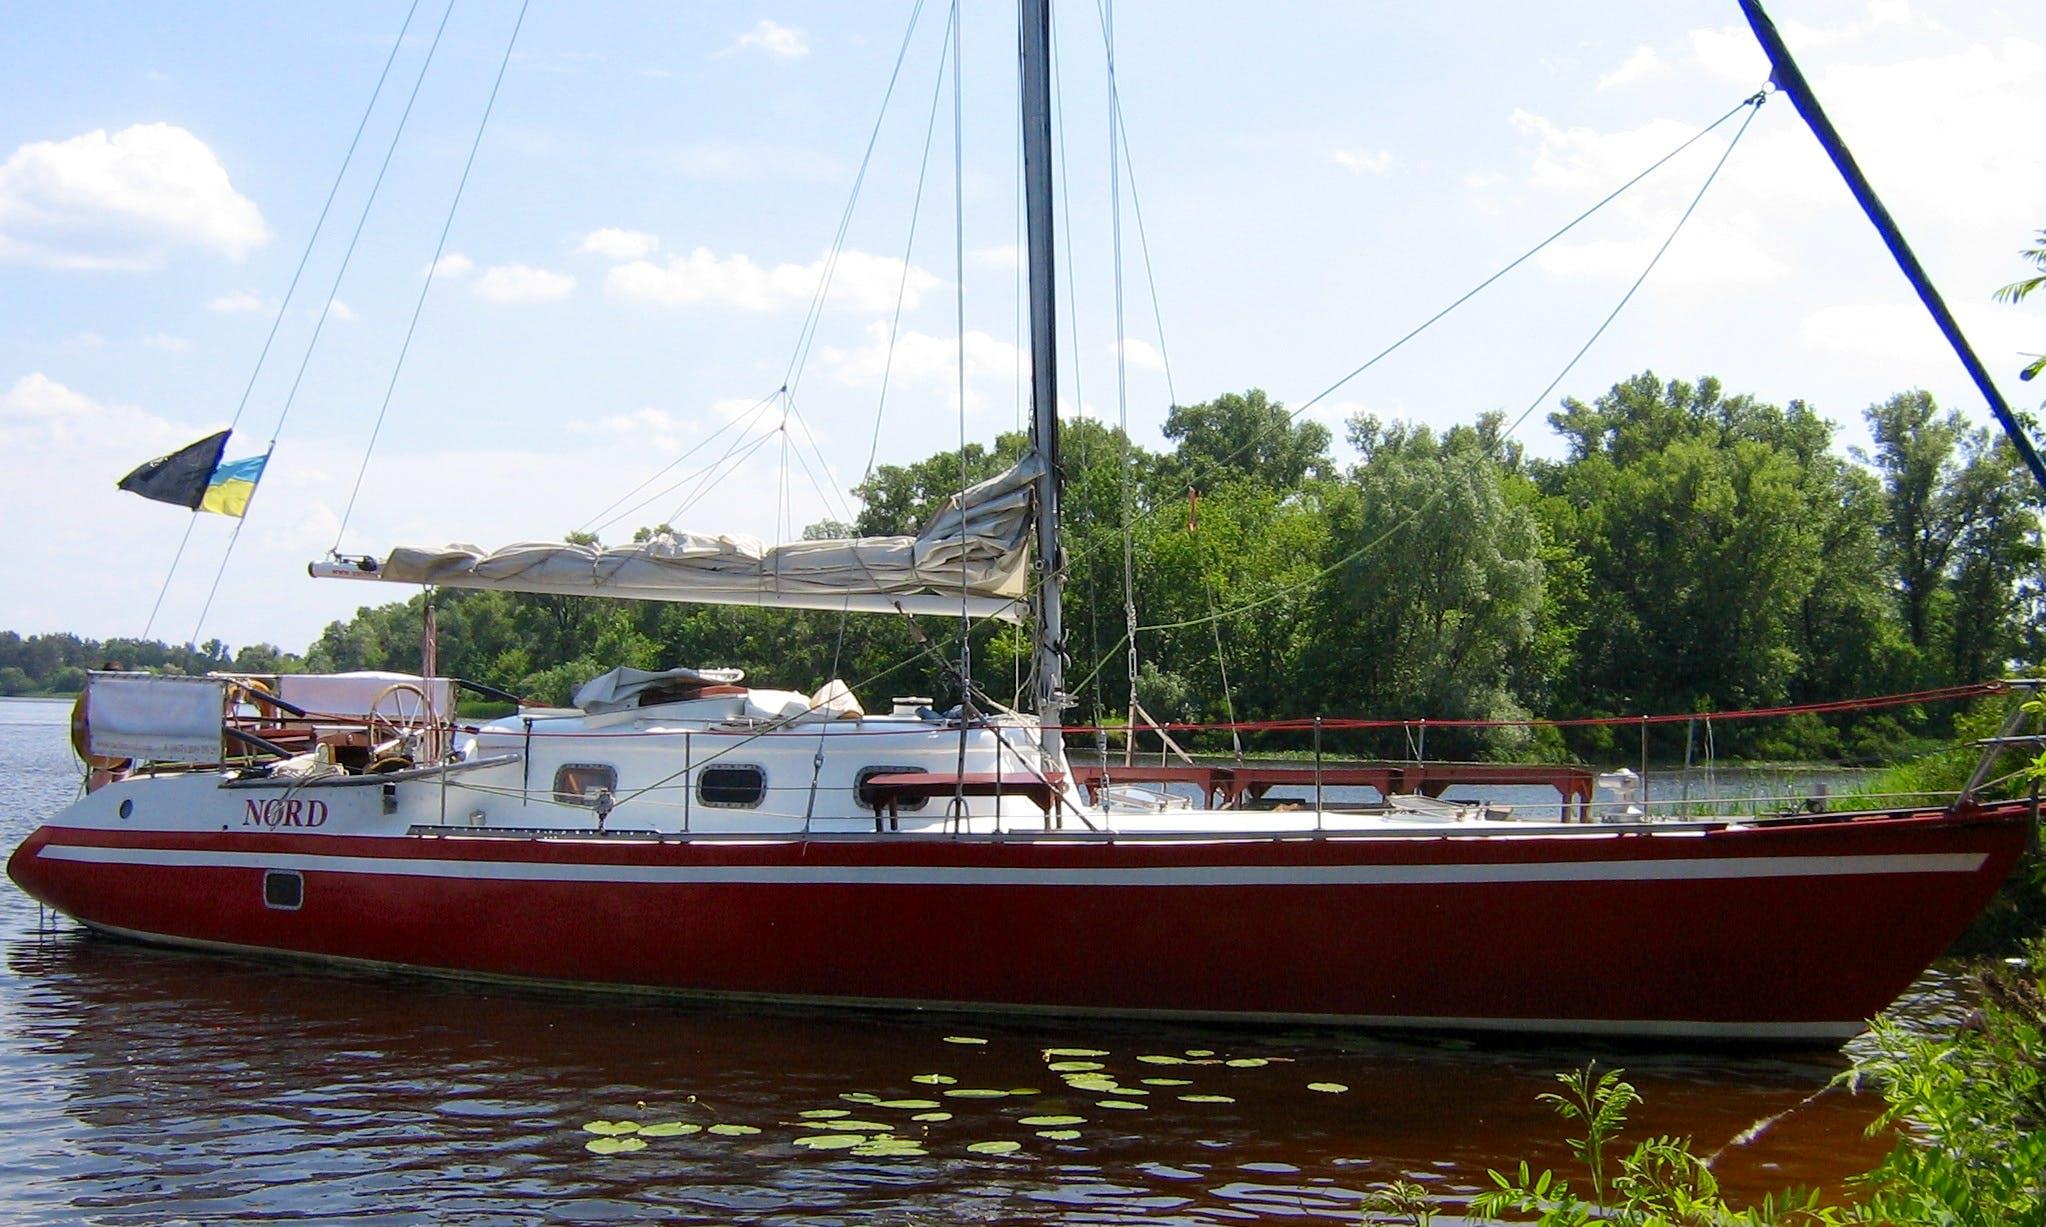 Sailing Charter in Kyiv, Ukraine